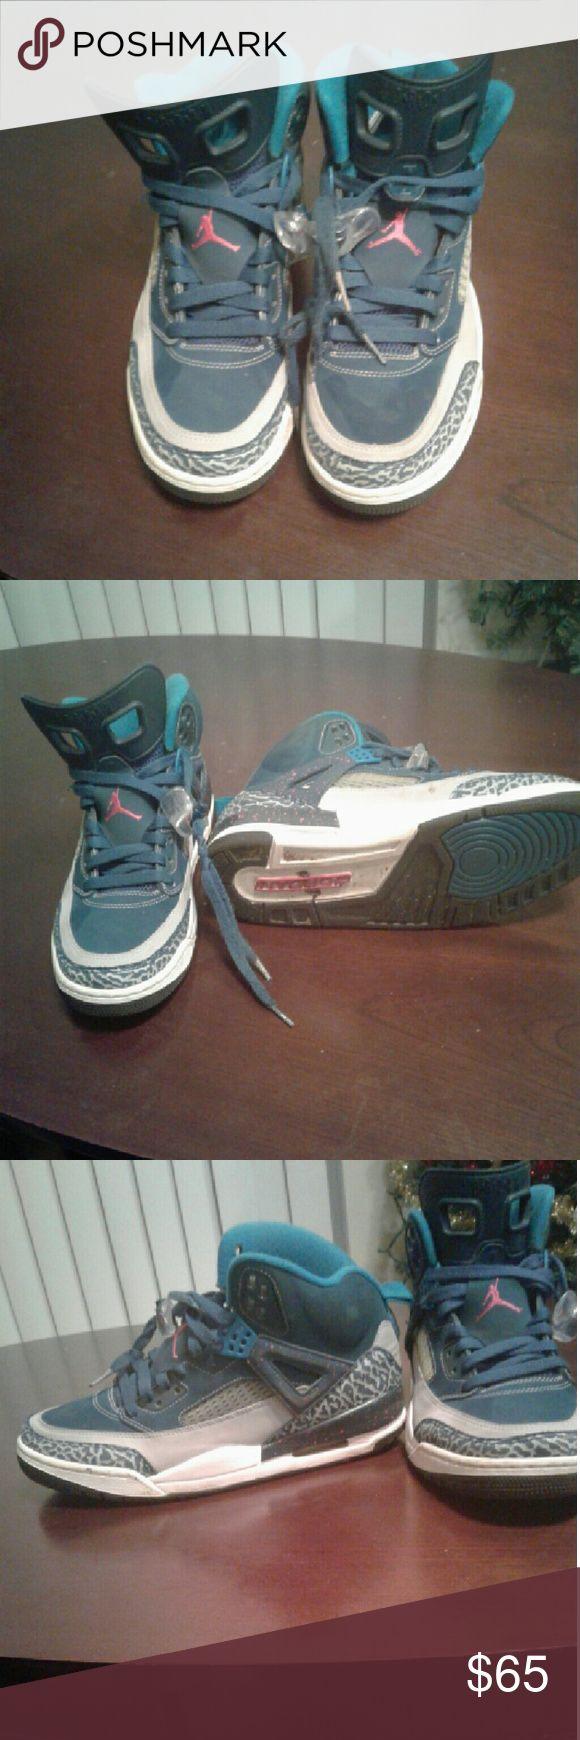 2015 Jordan spizike  Jordan /spike Lee version Lightly worn, comfortable , no discoloration Shoes Sneakers